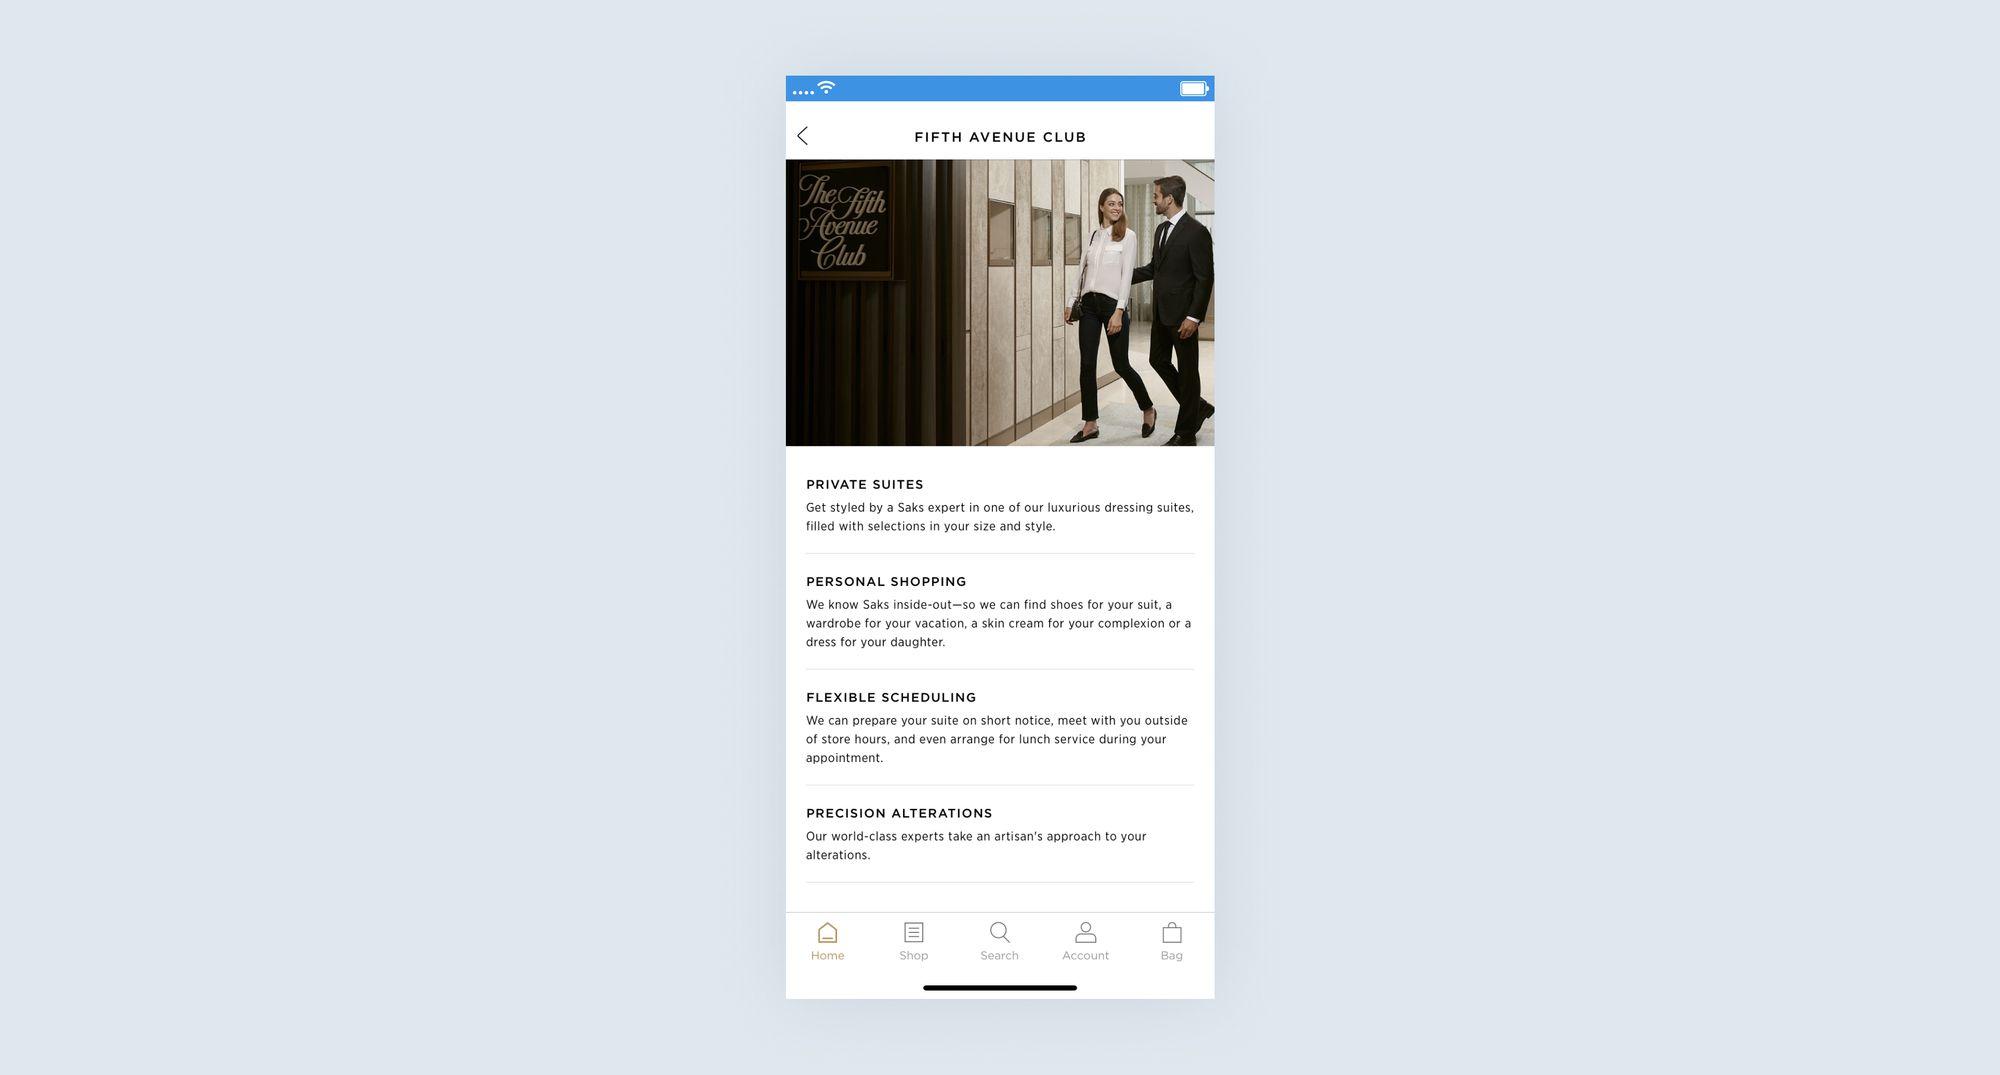 Saks Fifth Avenue Club mobile app